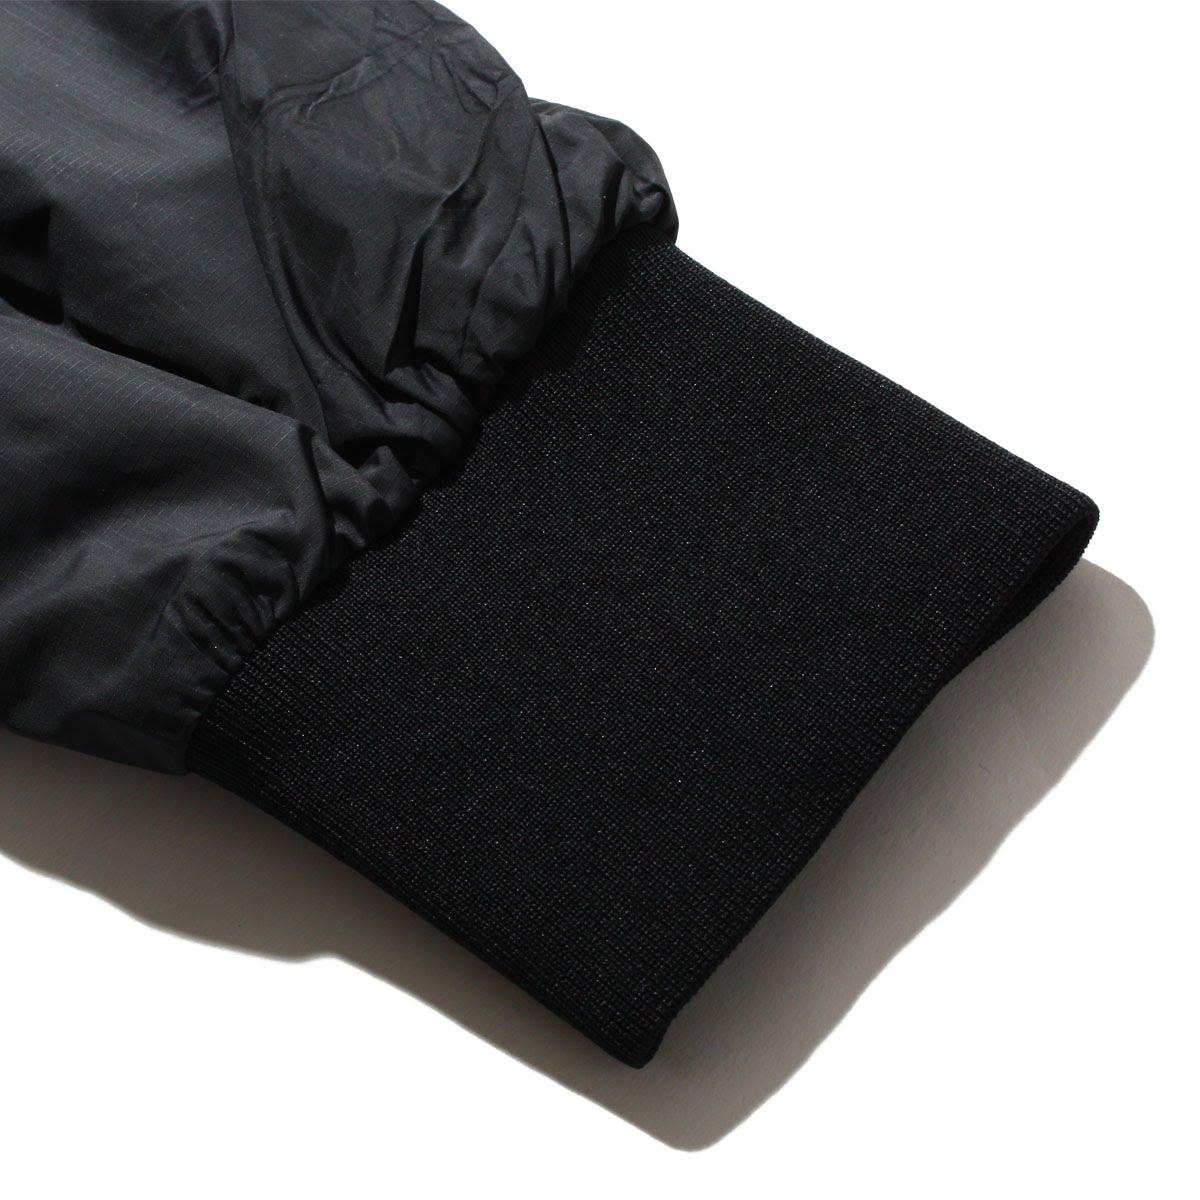 NIKE AS W NSW WR JKT GX (Nike women wind runner jacket GX) BLACK/BLACK/ OBSIDIAN/WHITE 18SU-I